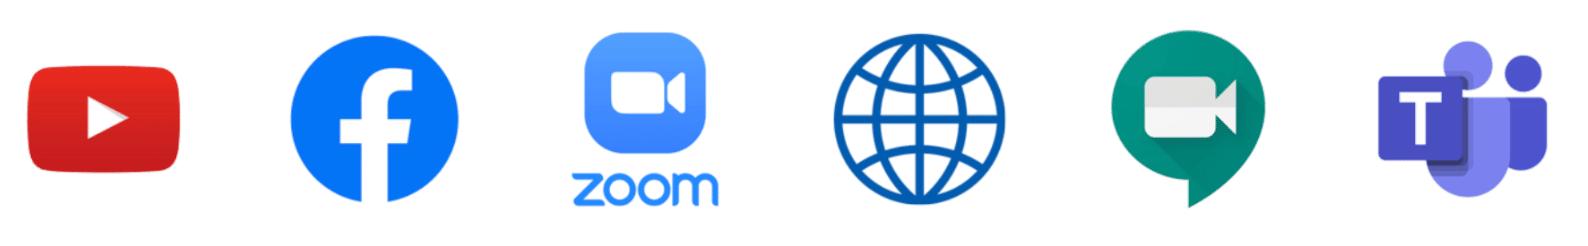 video livestreaming platforms